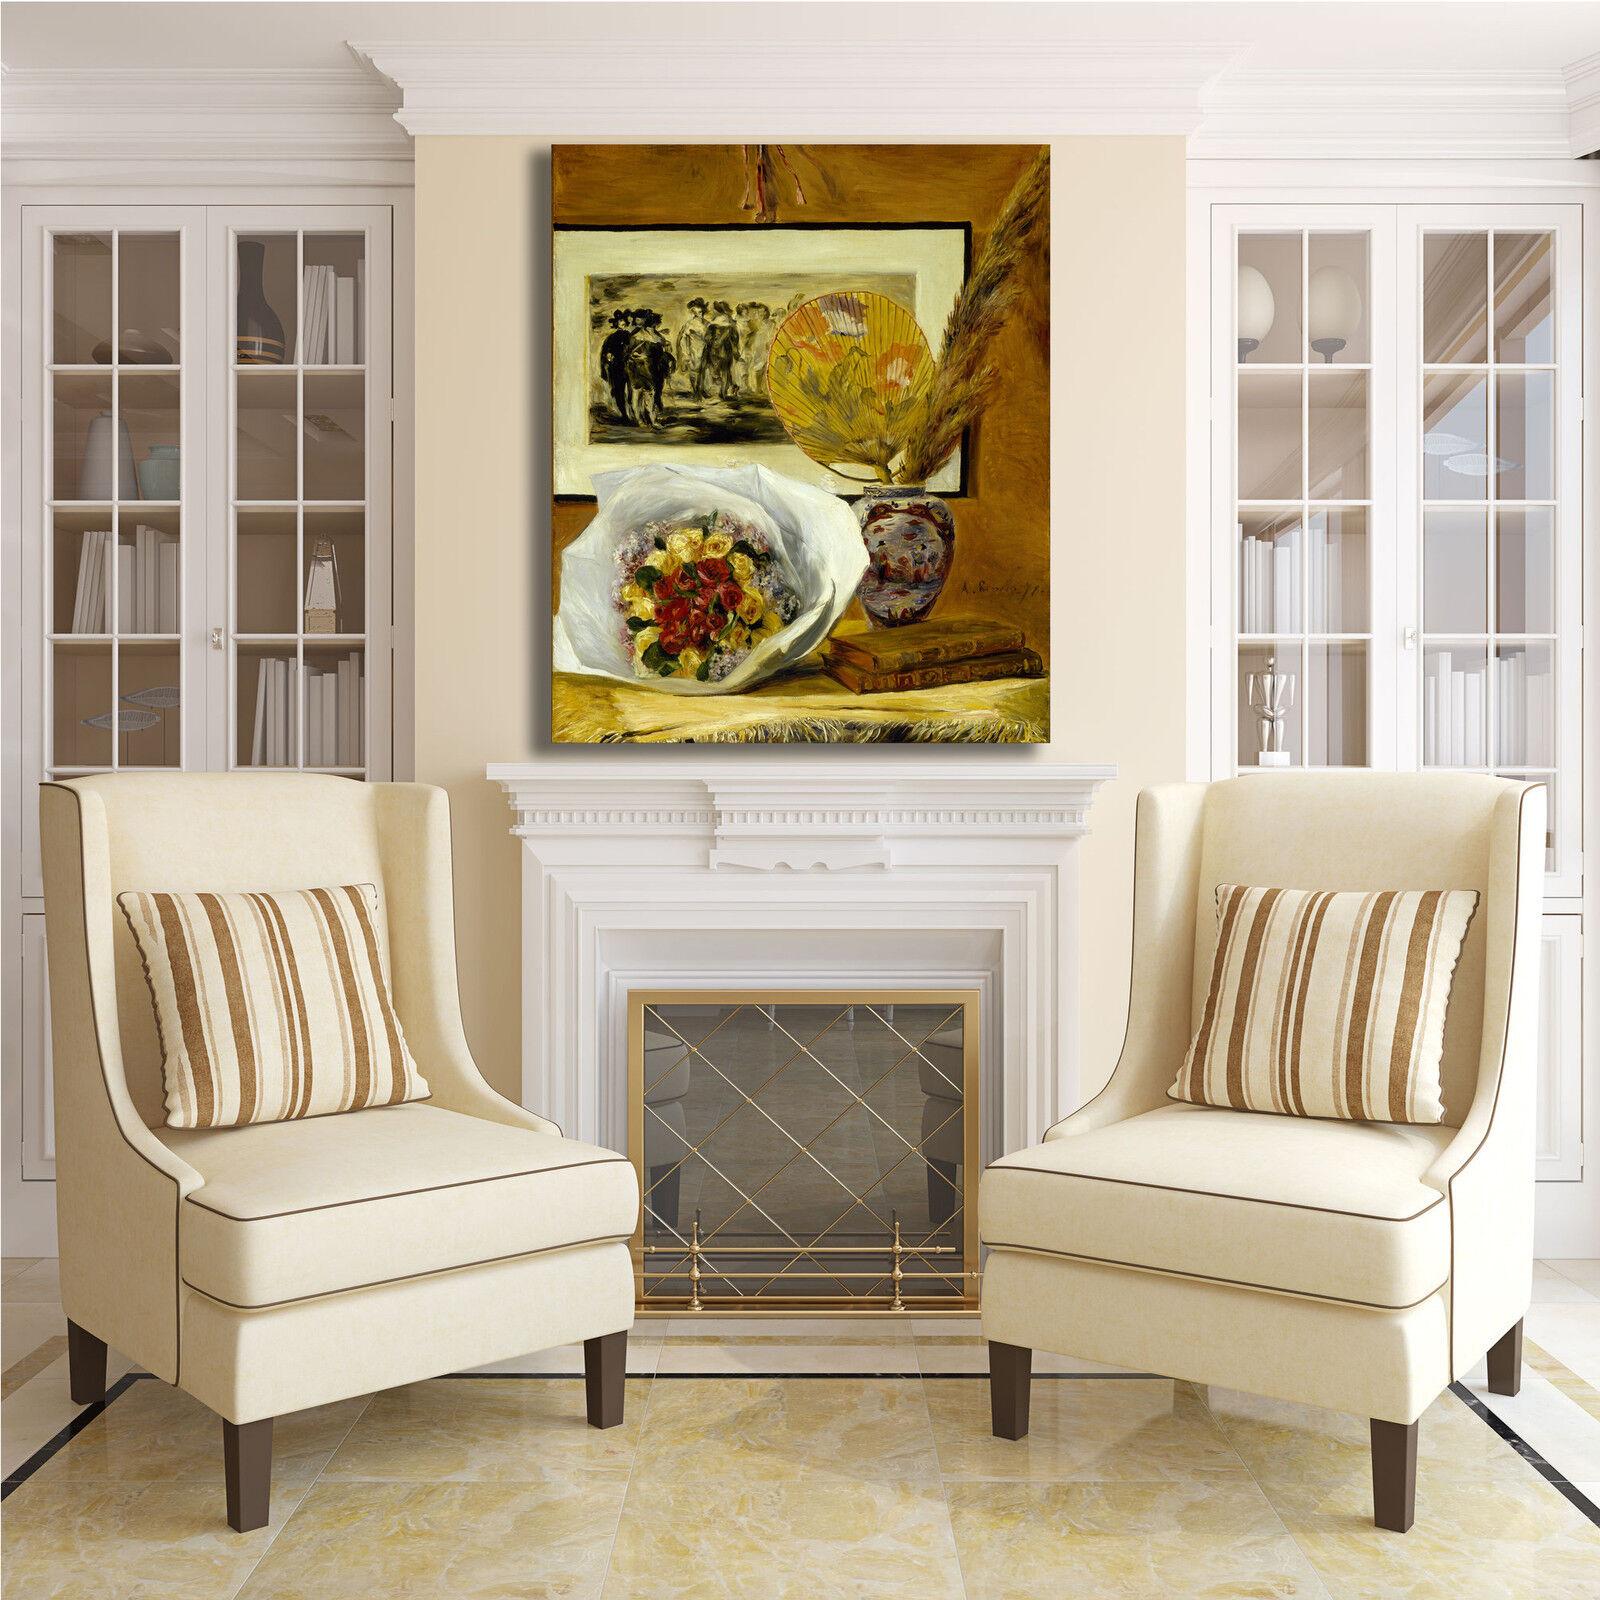 Renoir natura morta morta morta fiori design quadro stampa tela dipinto telaio arRouge o casa bcd8bf